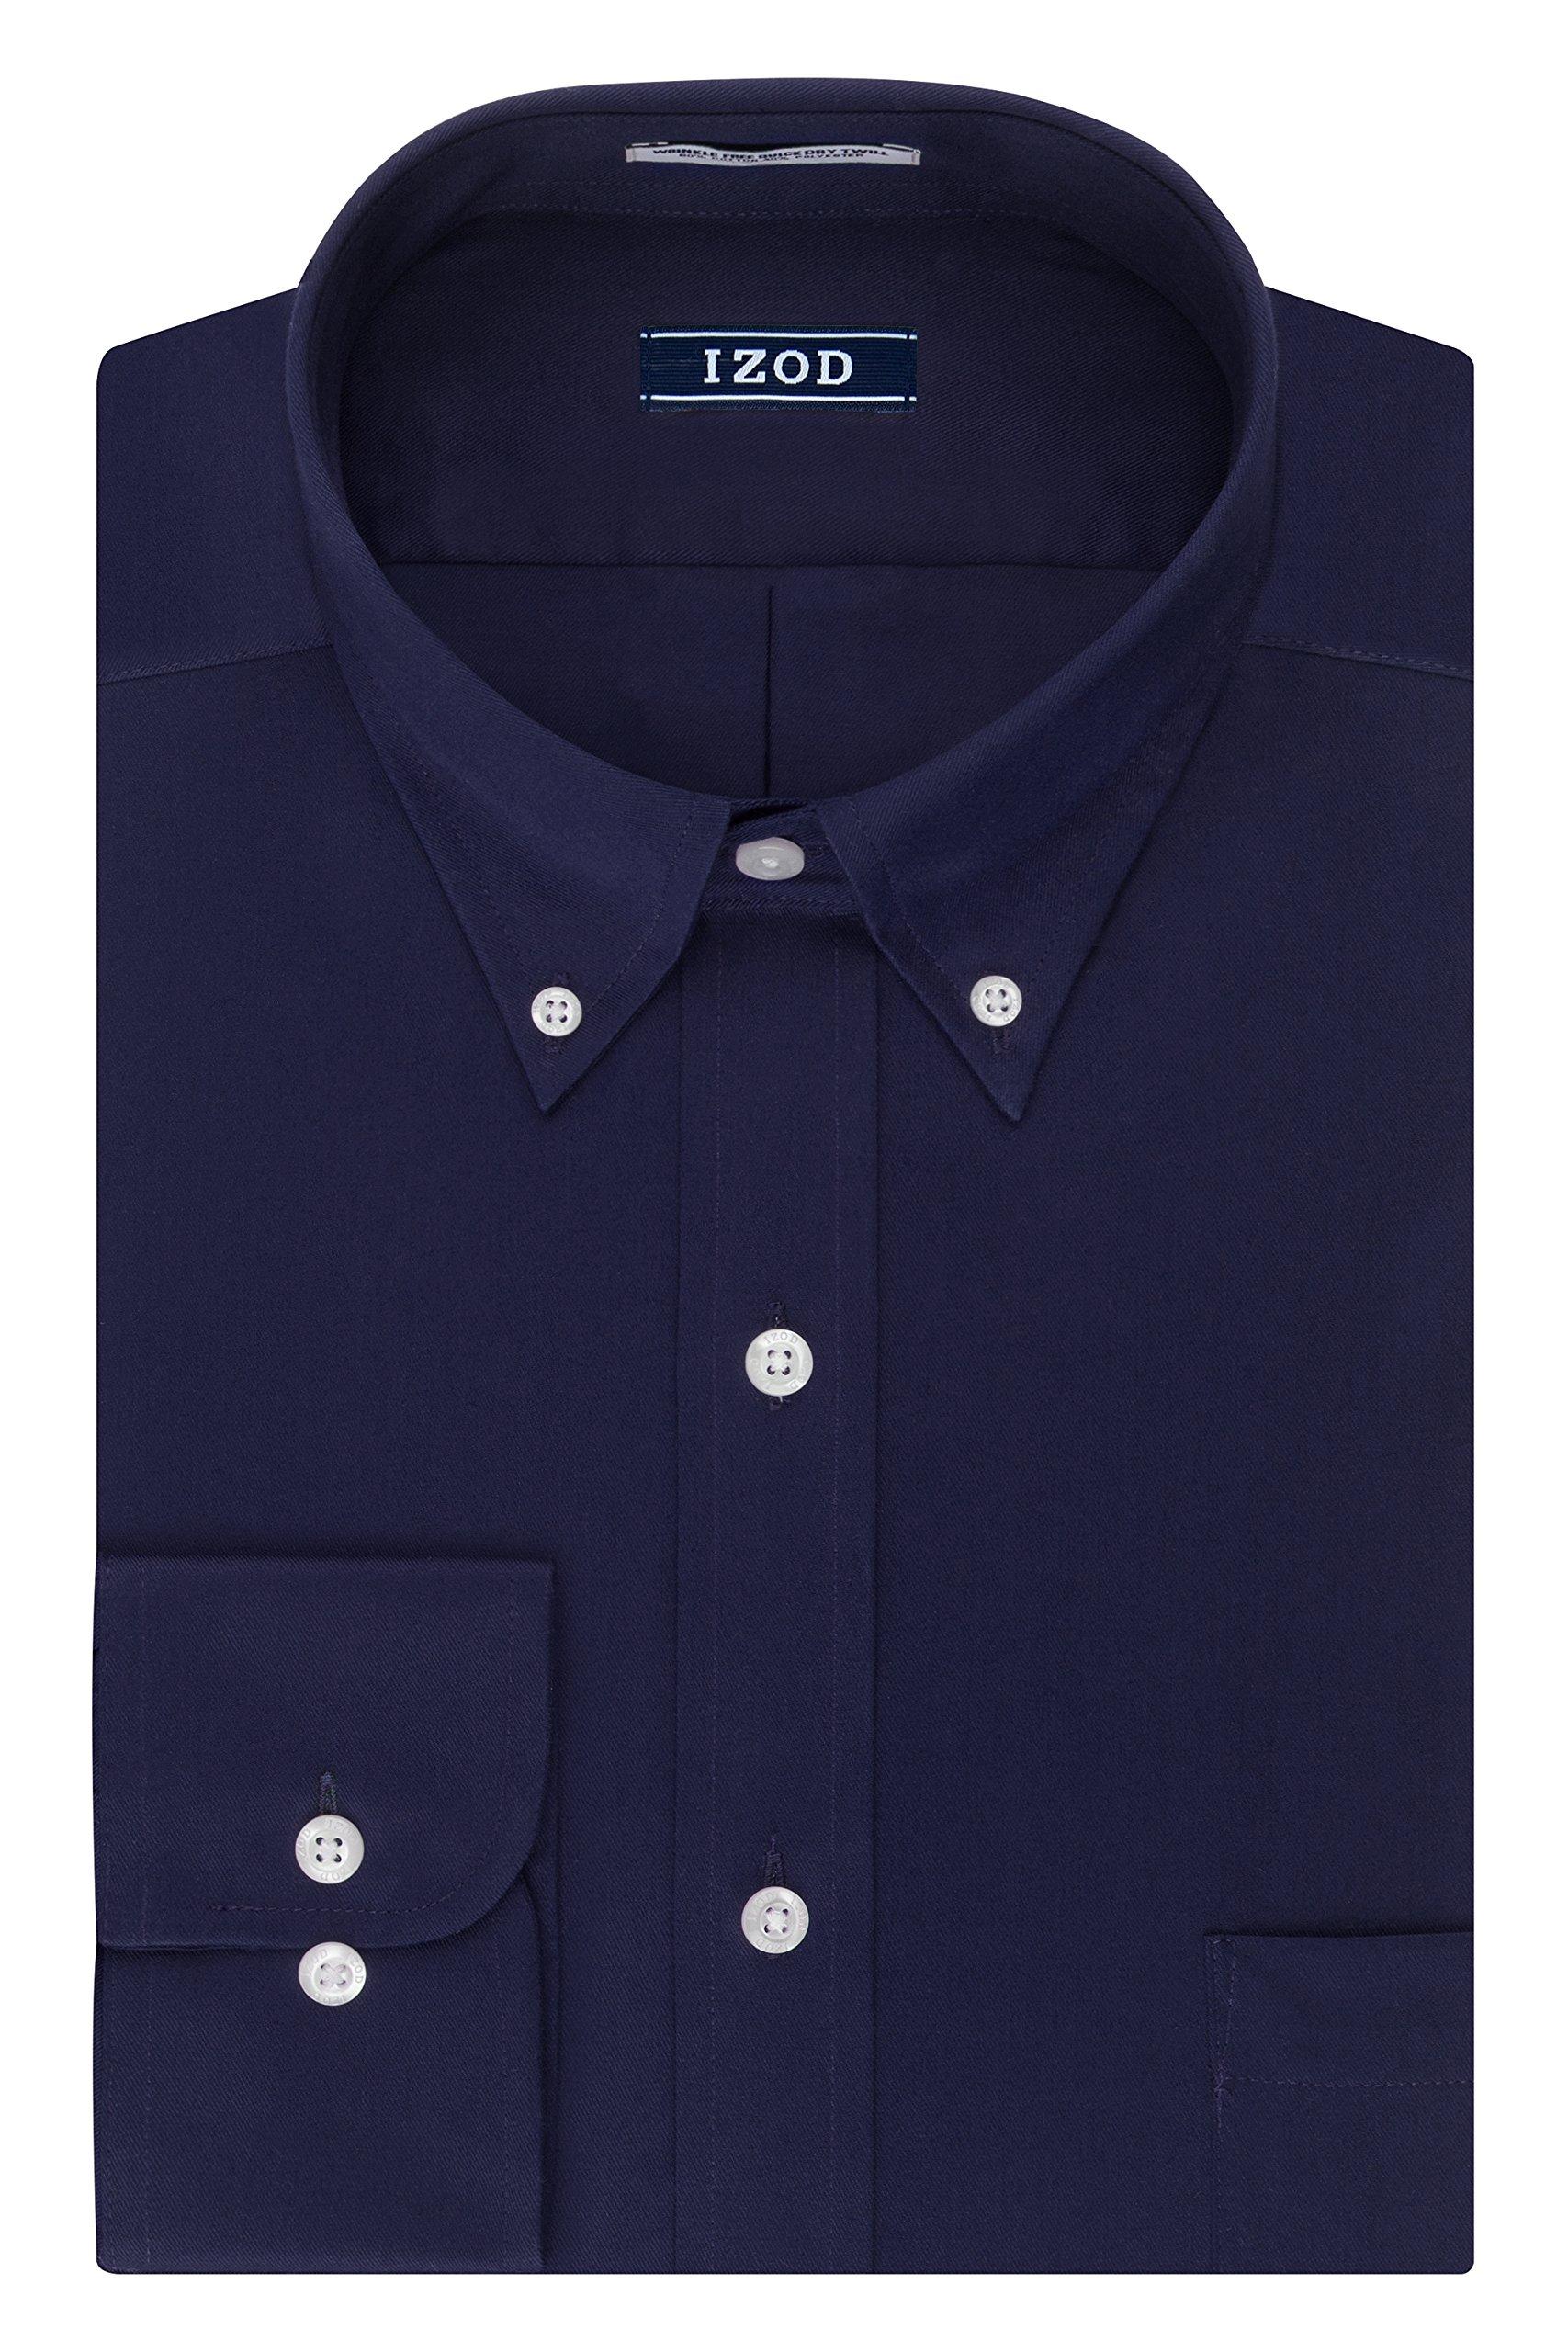 IZOD Men's Regular Fit Stretch Solid Buttondown Collar Dress Shirt, Sailor Navy, 14''-14.5'' Neck 32''-33'' Sleeve